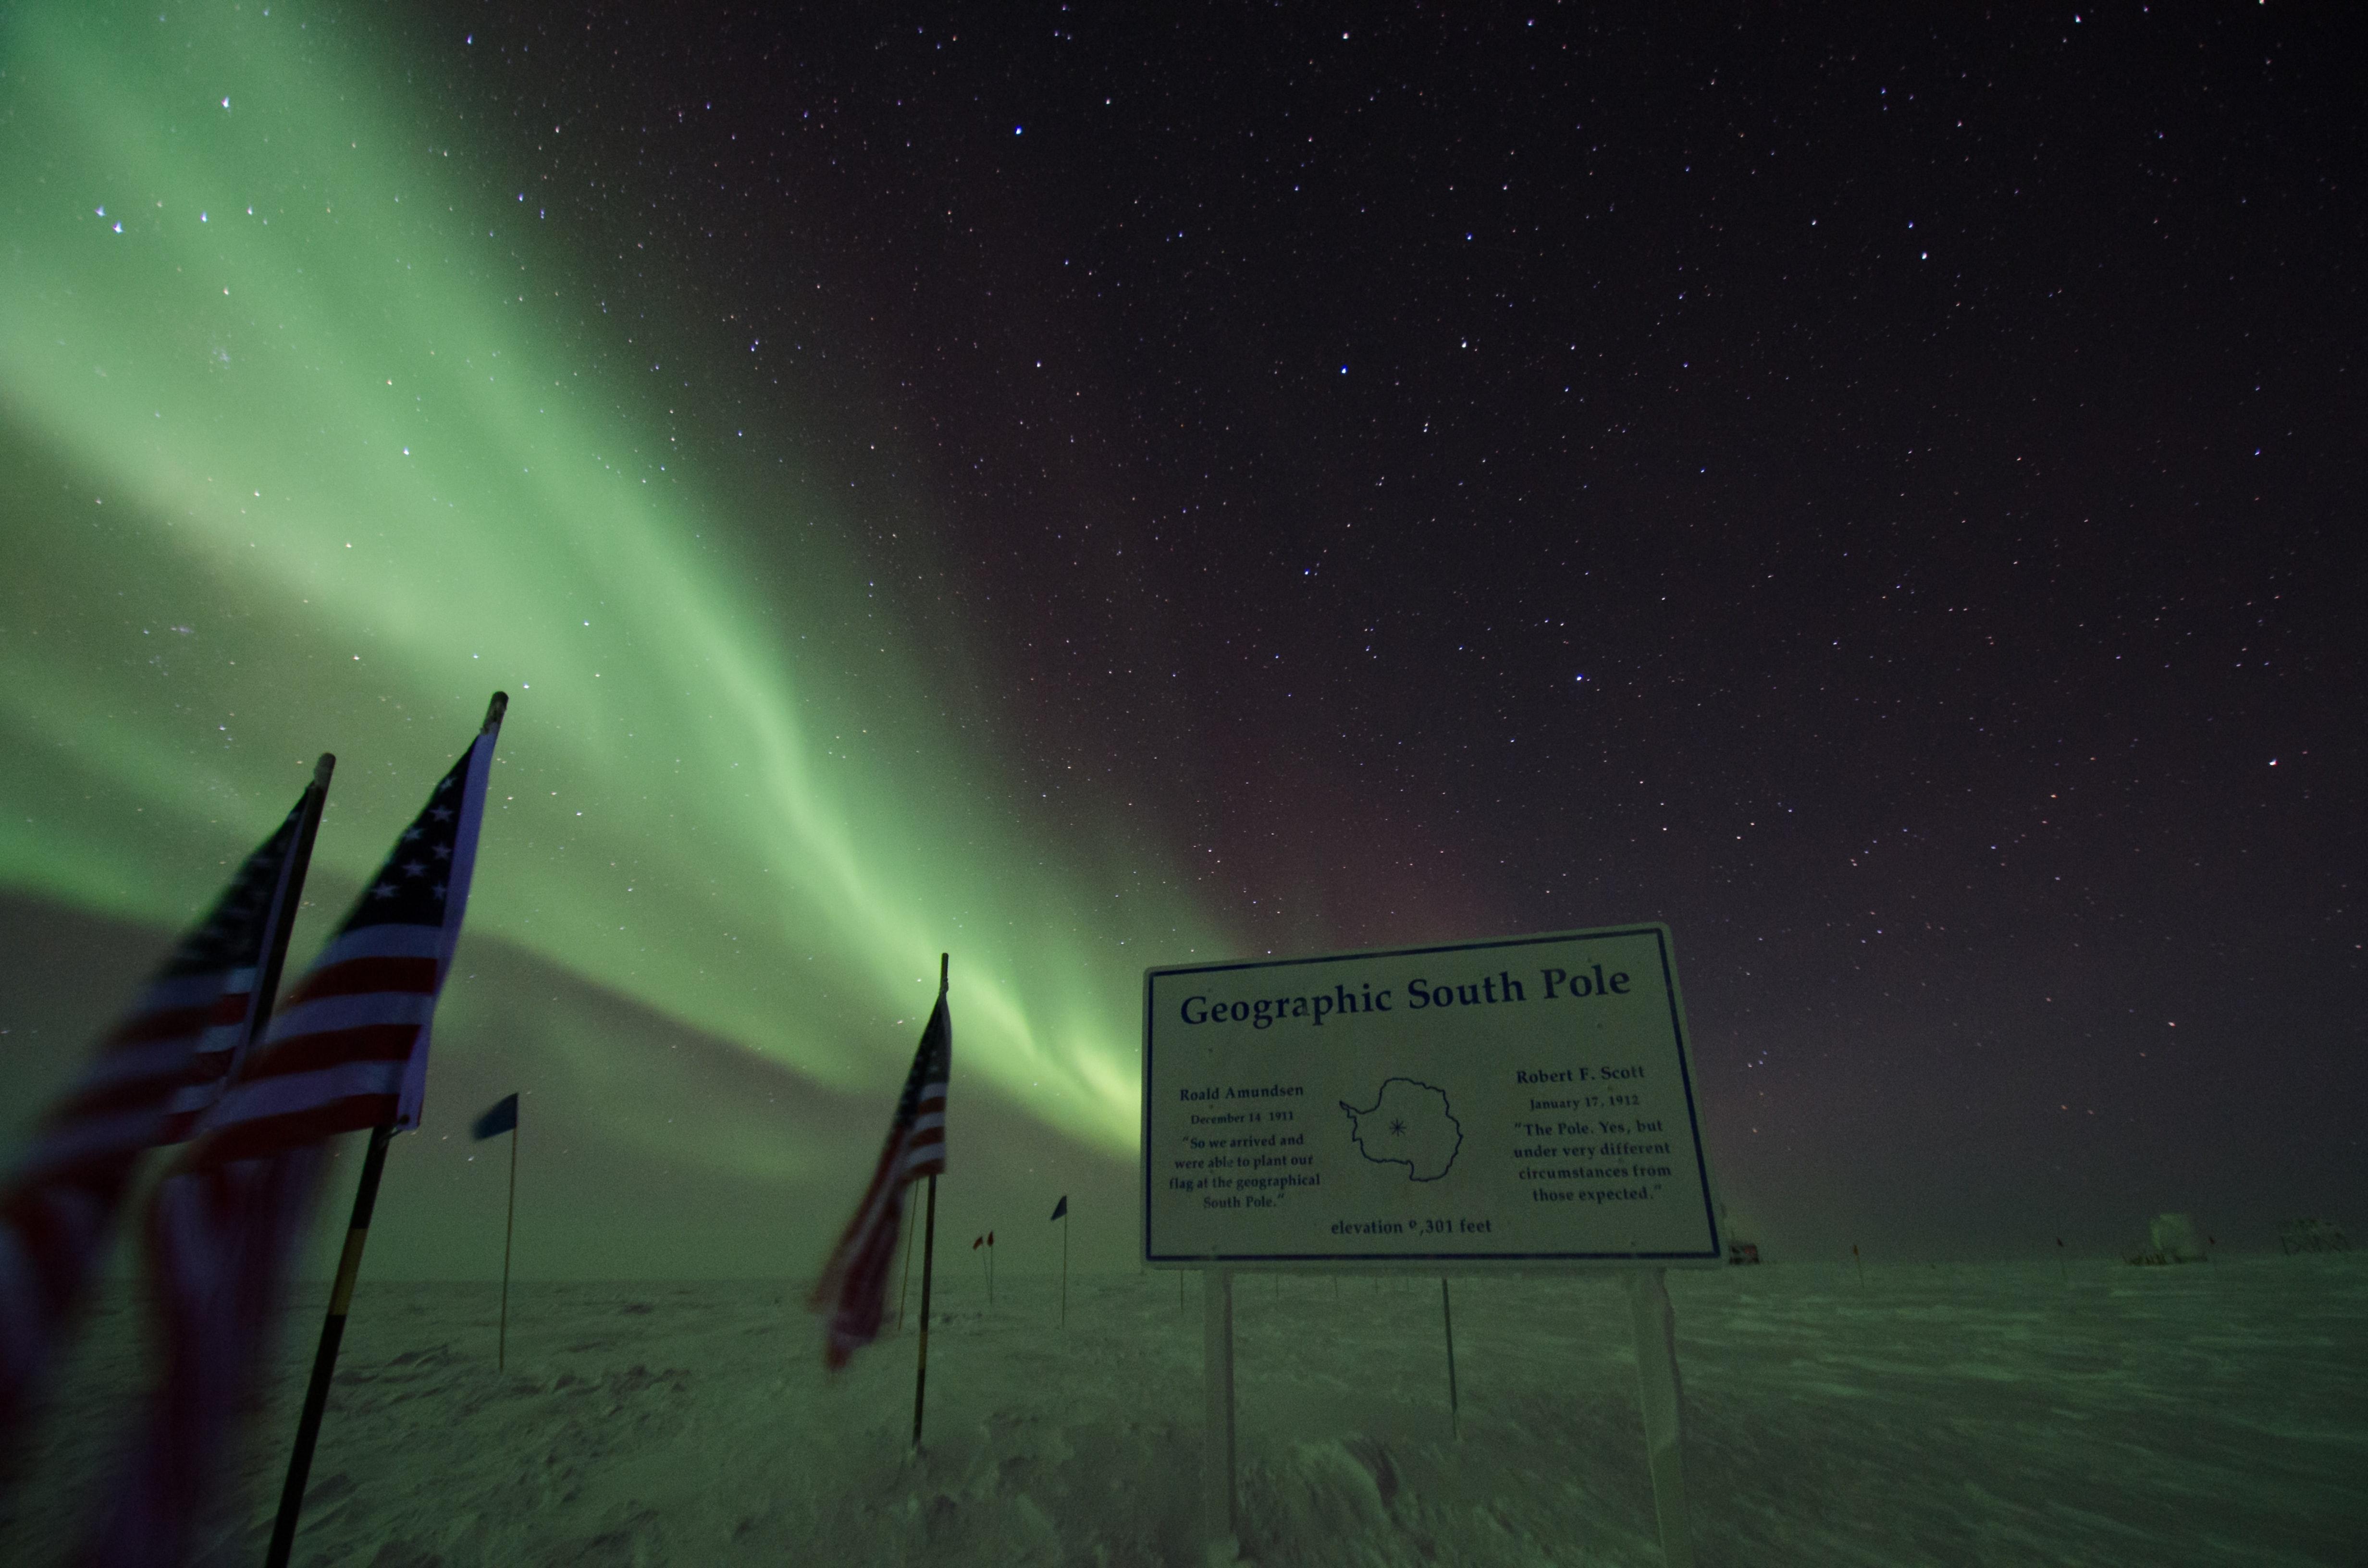 Credit: NOAA/Unsplash